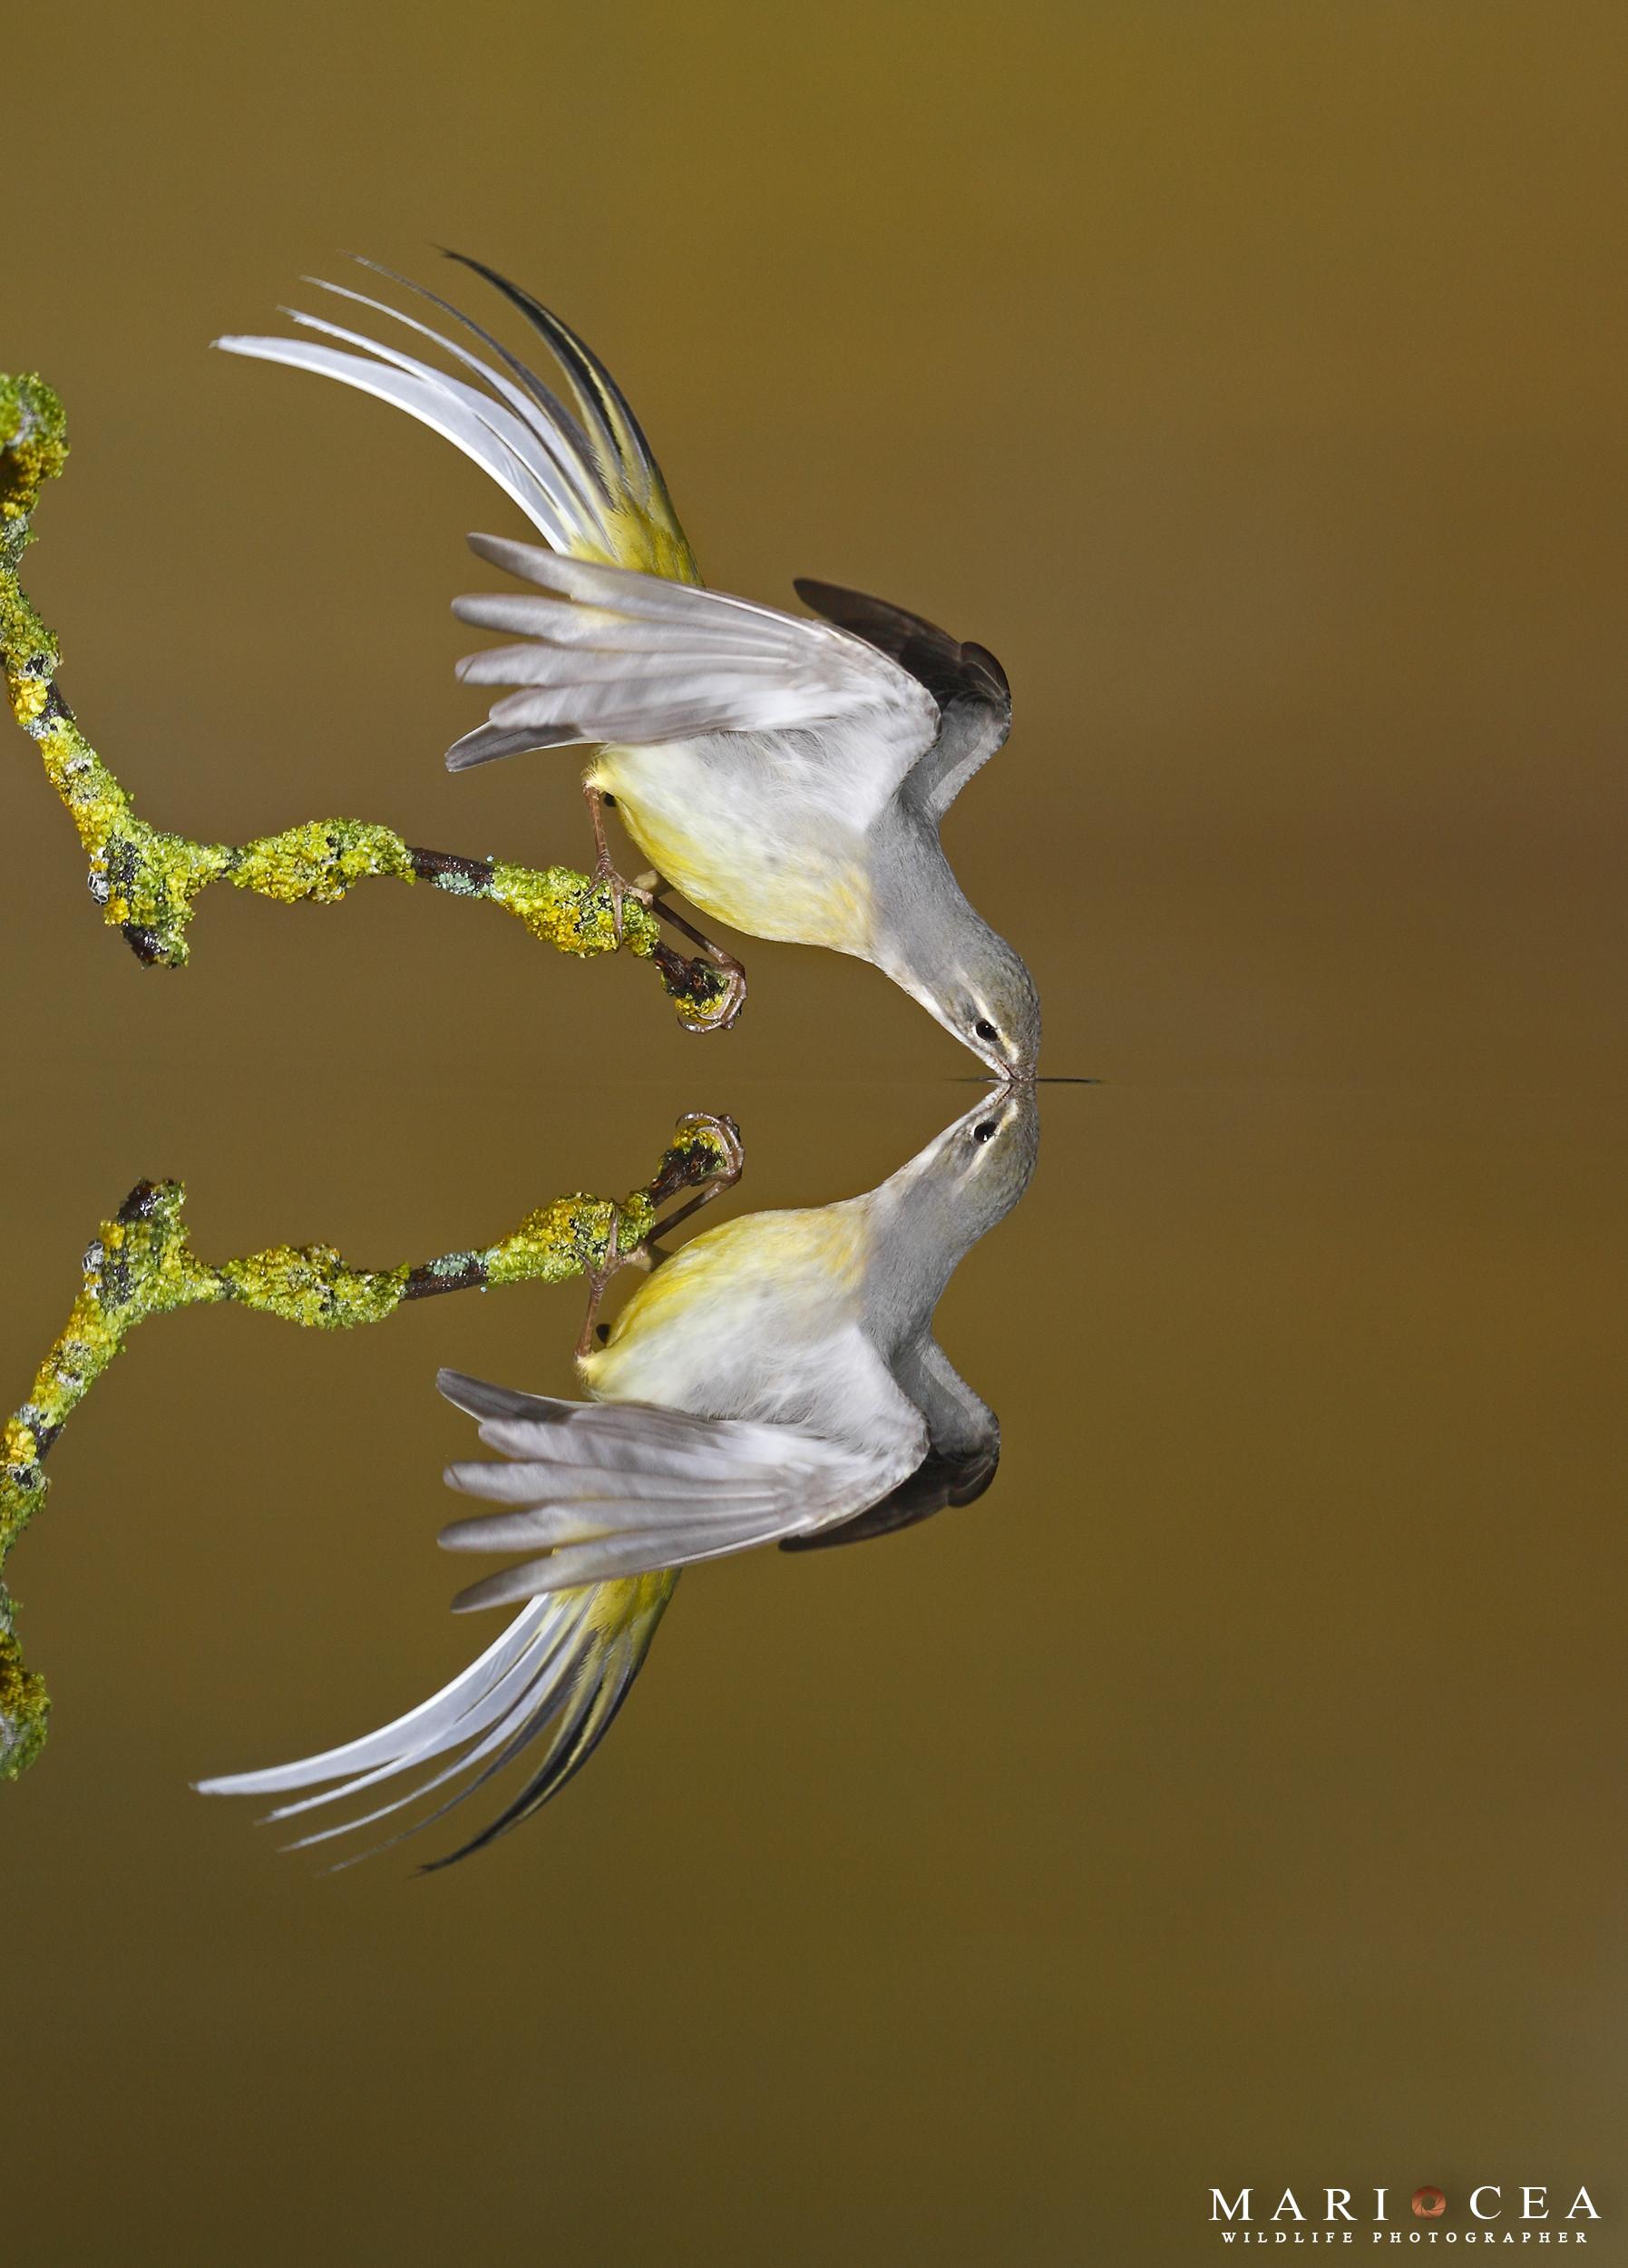 Foto de Fotografías de naturaleza tomadas por Mario Cea (11/12)